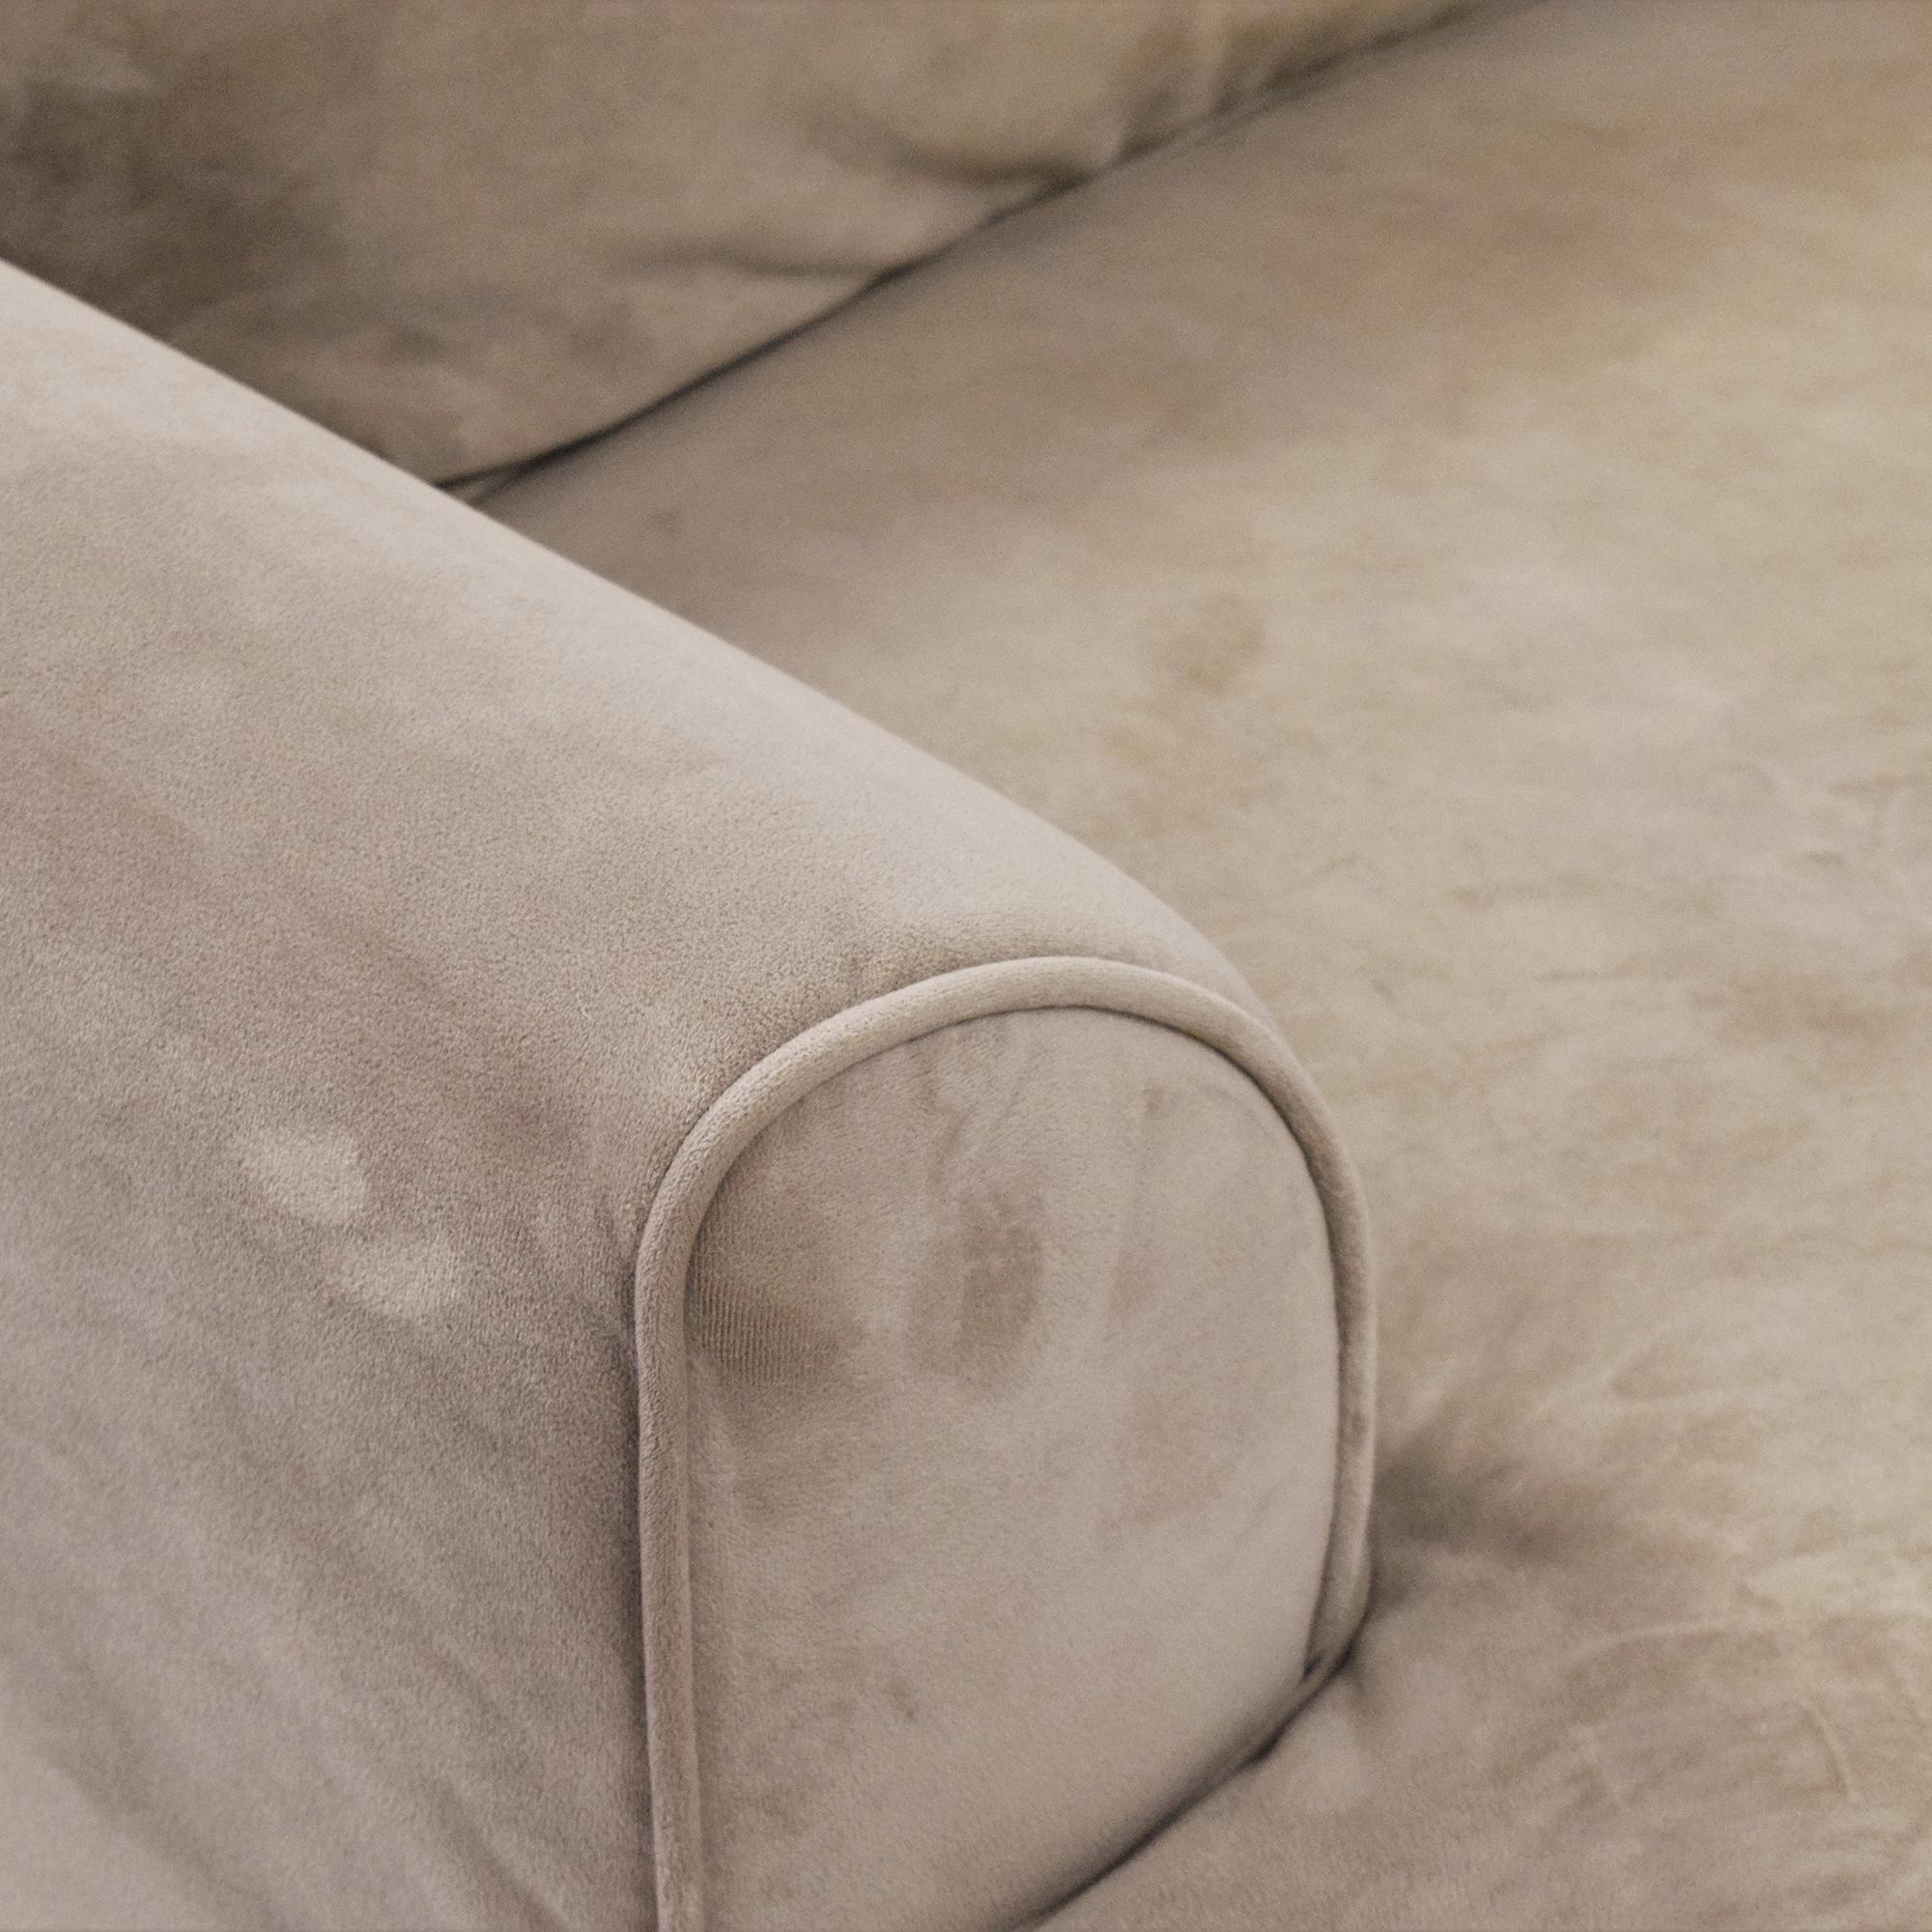 JC Penney JC Penney Corner Sectional Sofa price